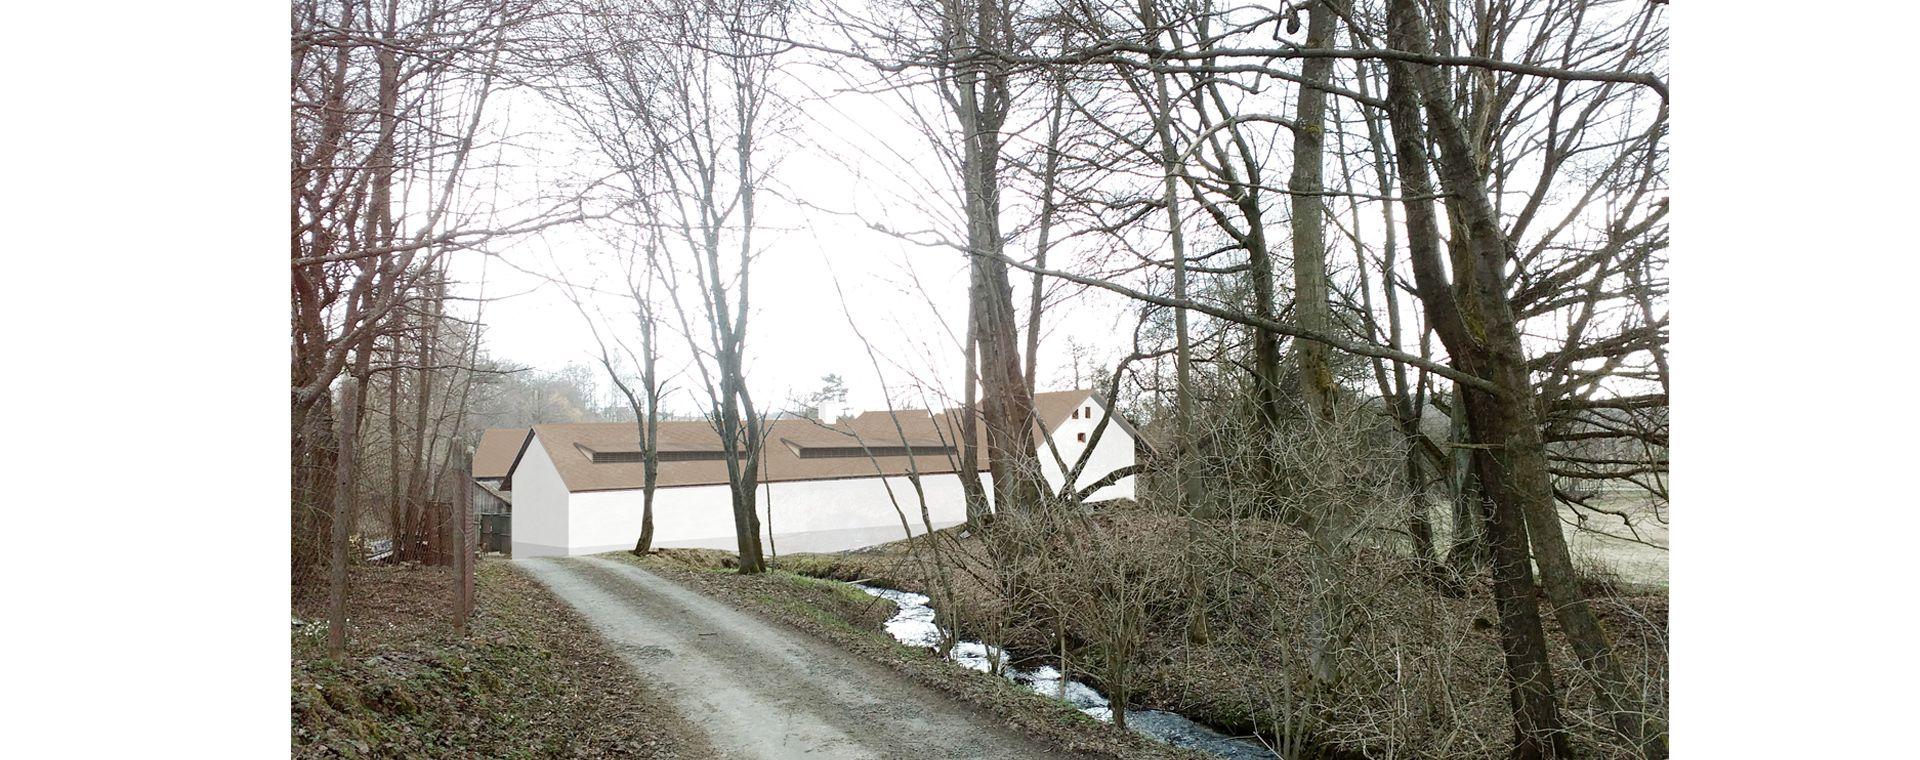 The reconstruction of the mill in Svetnov, 2016-2018, CZ